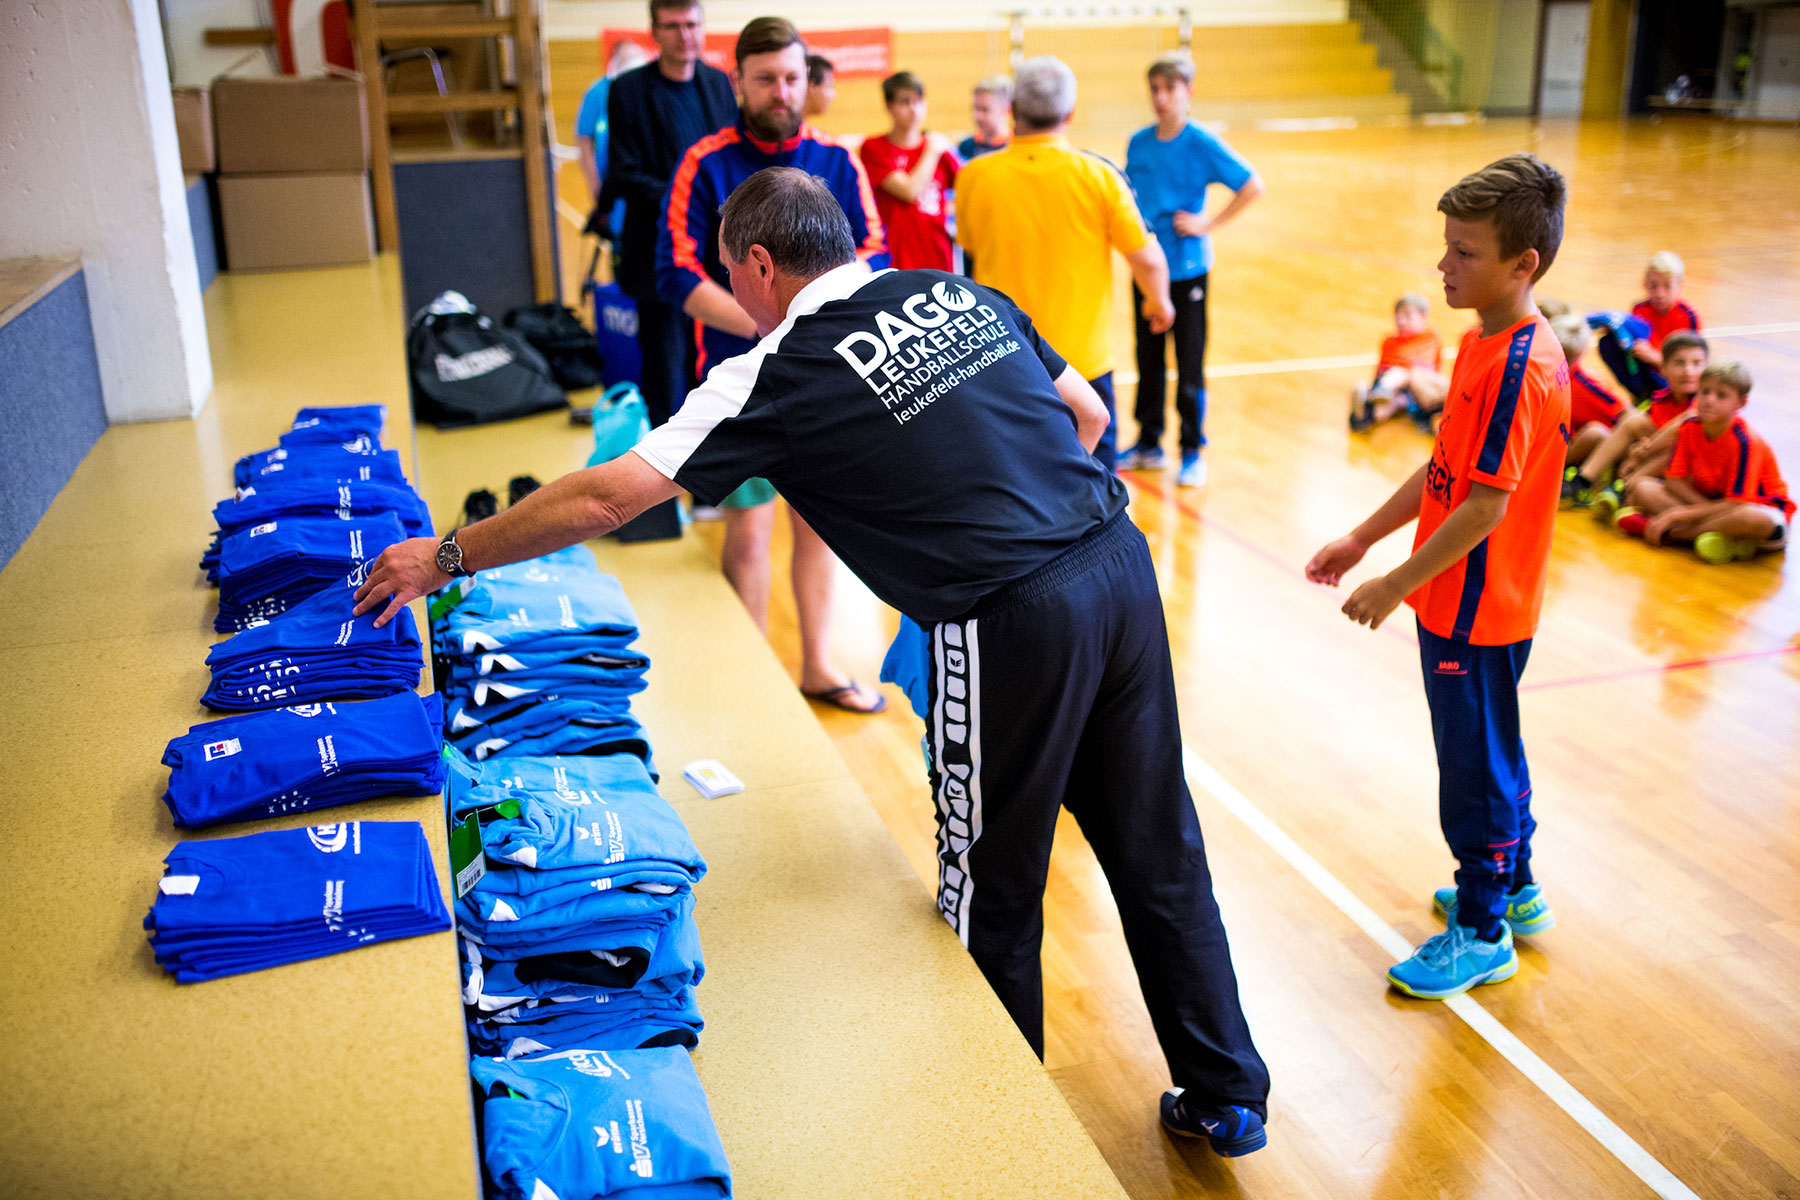 201809_Handballcamp_NDH (46)